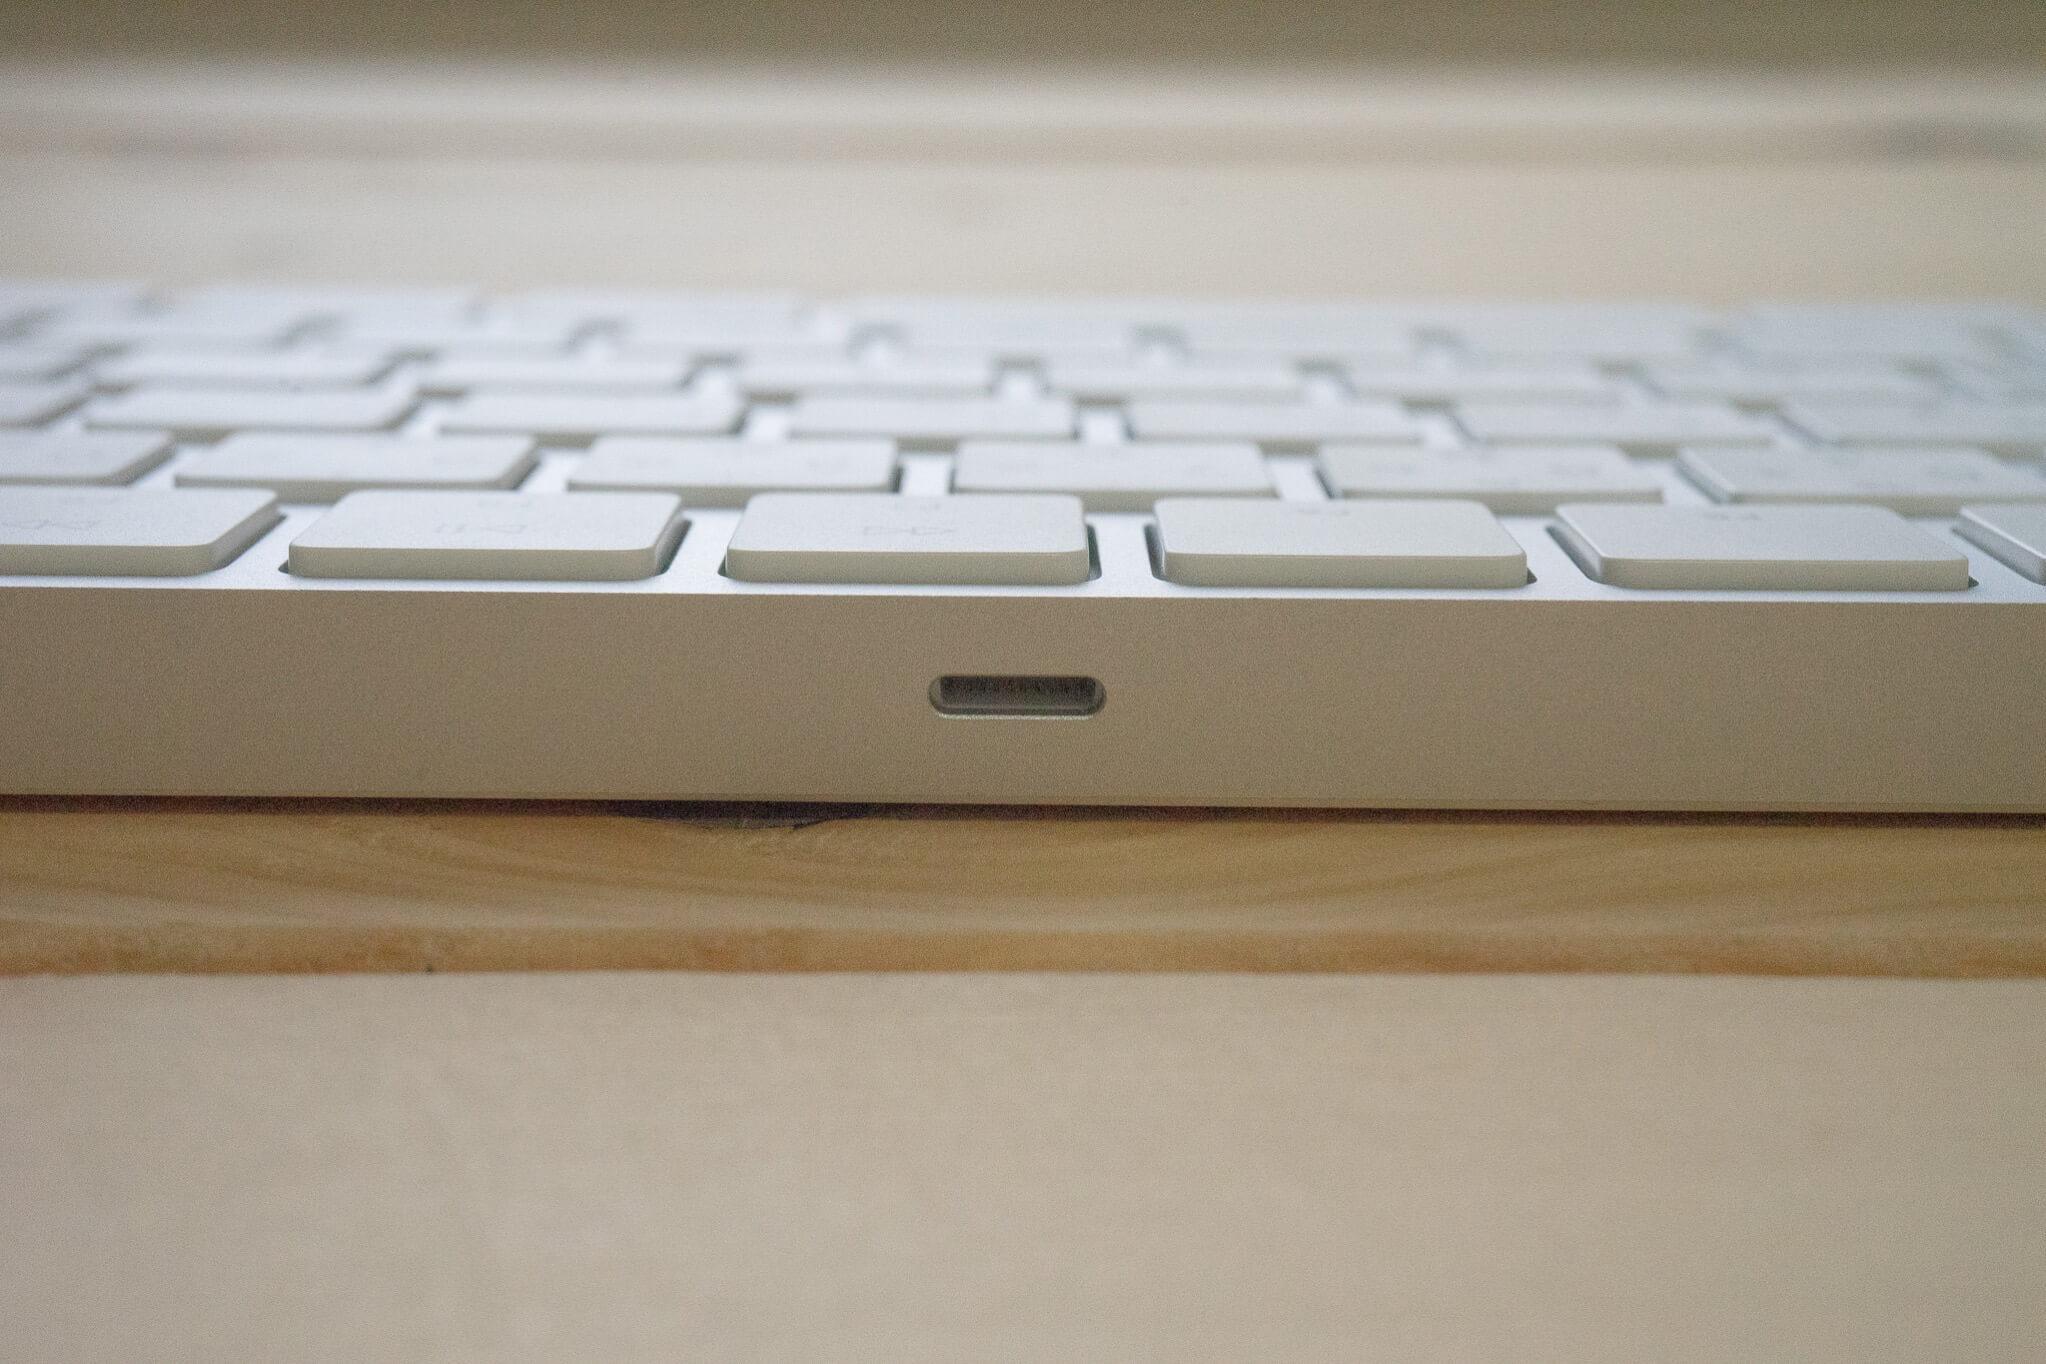 180816 magic keyboard 8